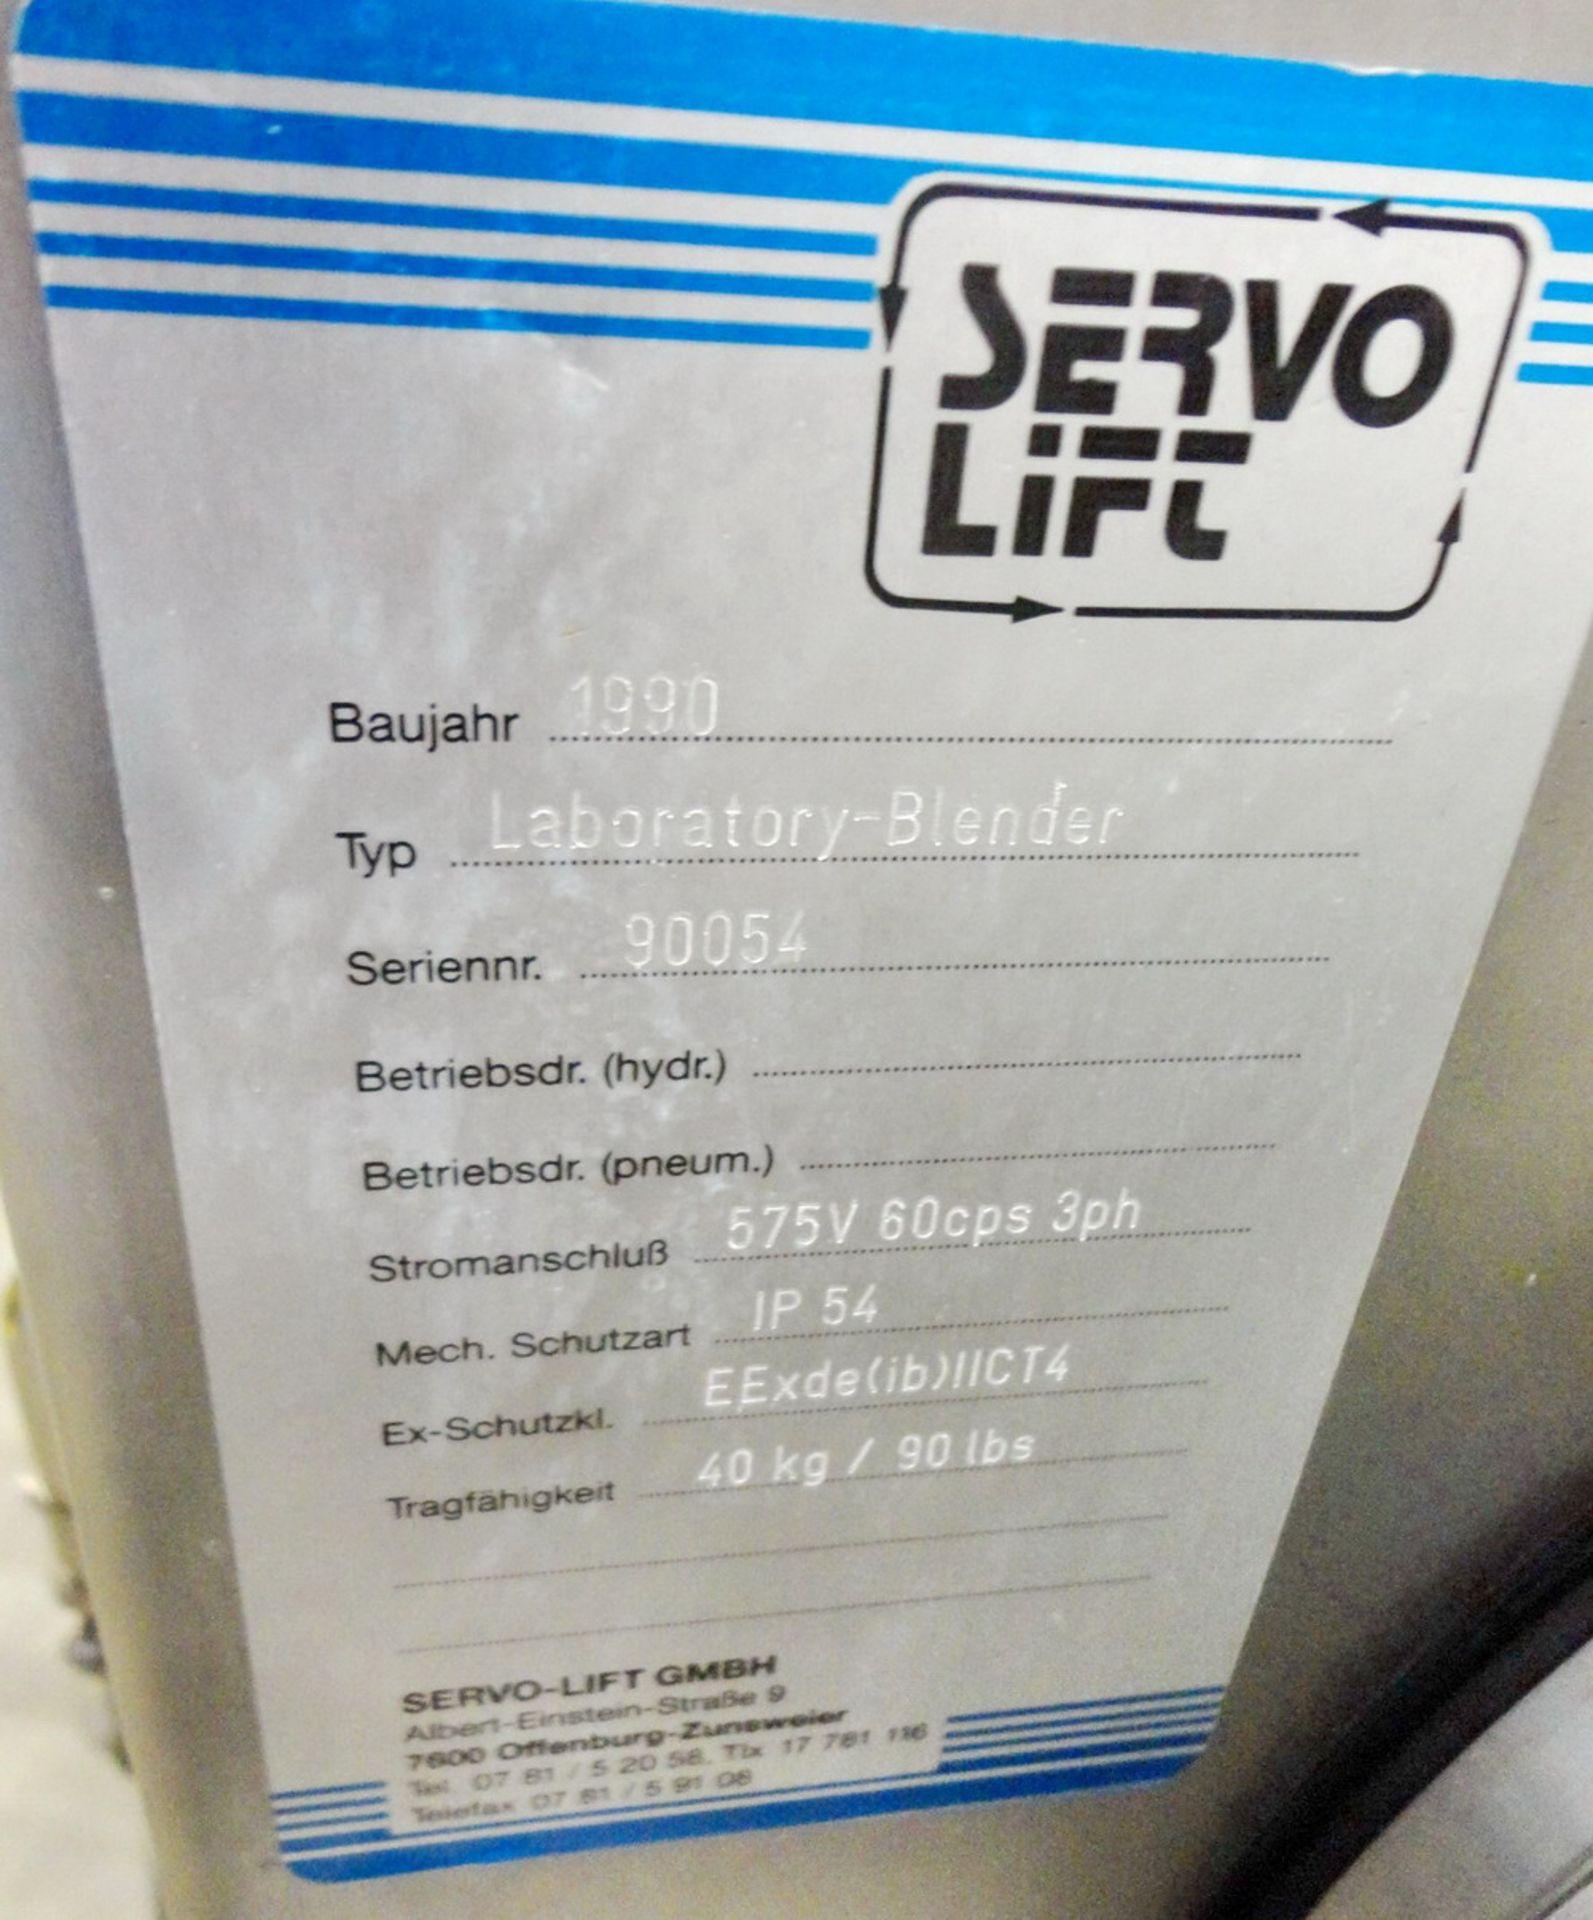 Lot 97 - Servolift Pilot Plant Blender, 40 KG capacity, S/N 90054